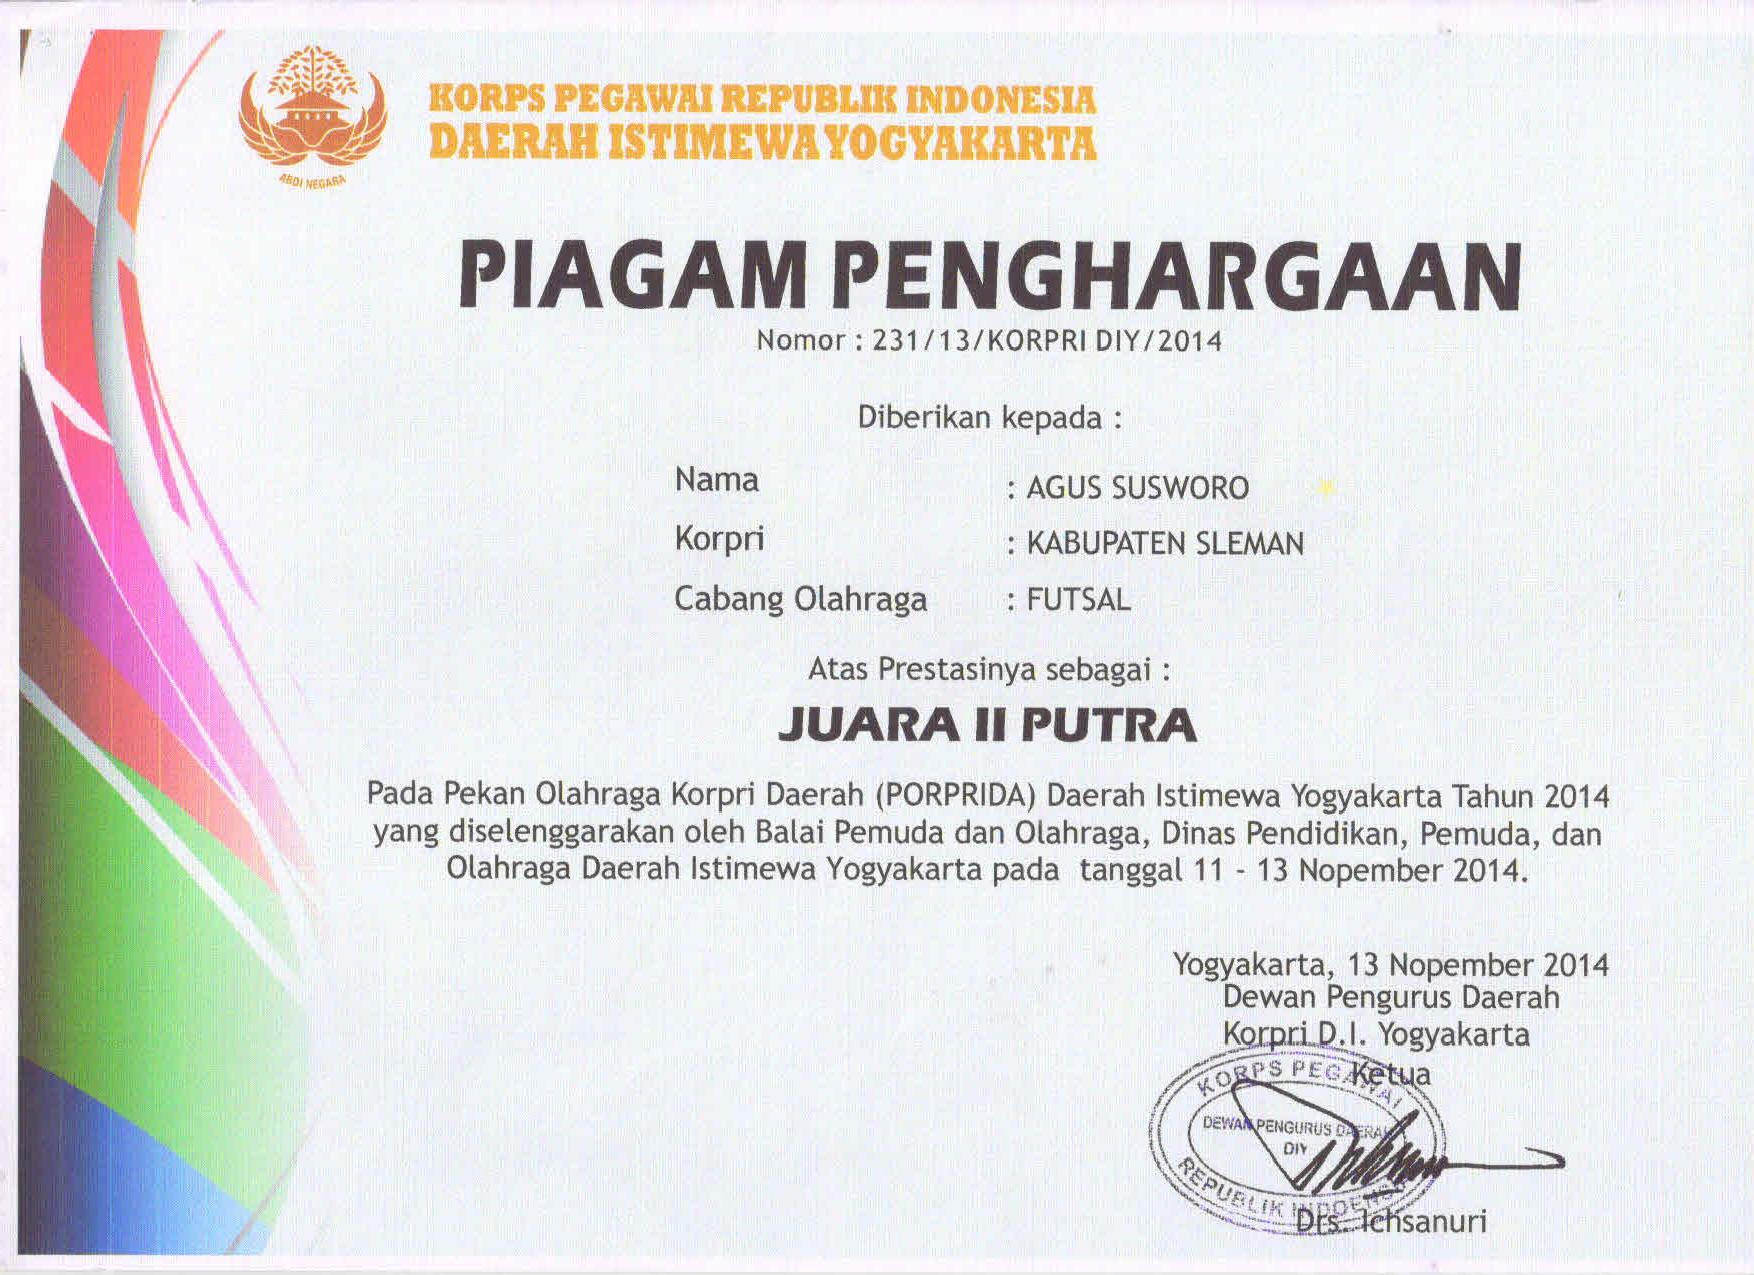 Pendidikan Olahraga | Staff Site Universitas Negeri Yogyakarta